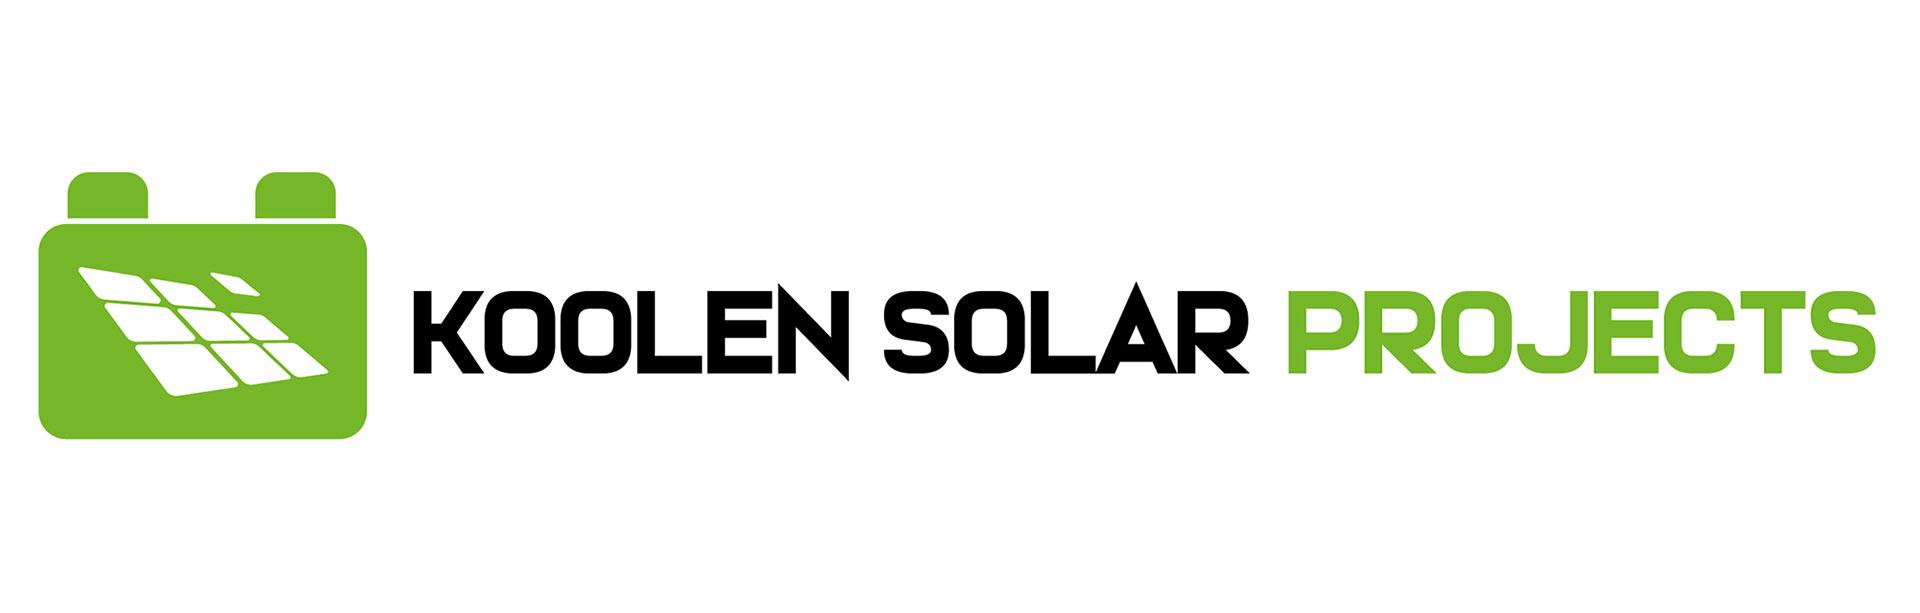 Koolen Solar Projects logo